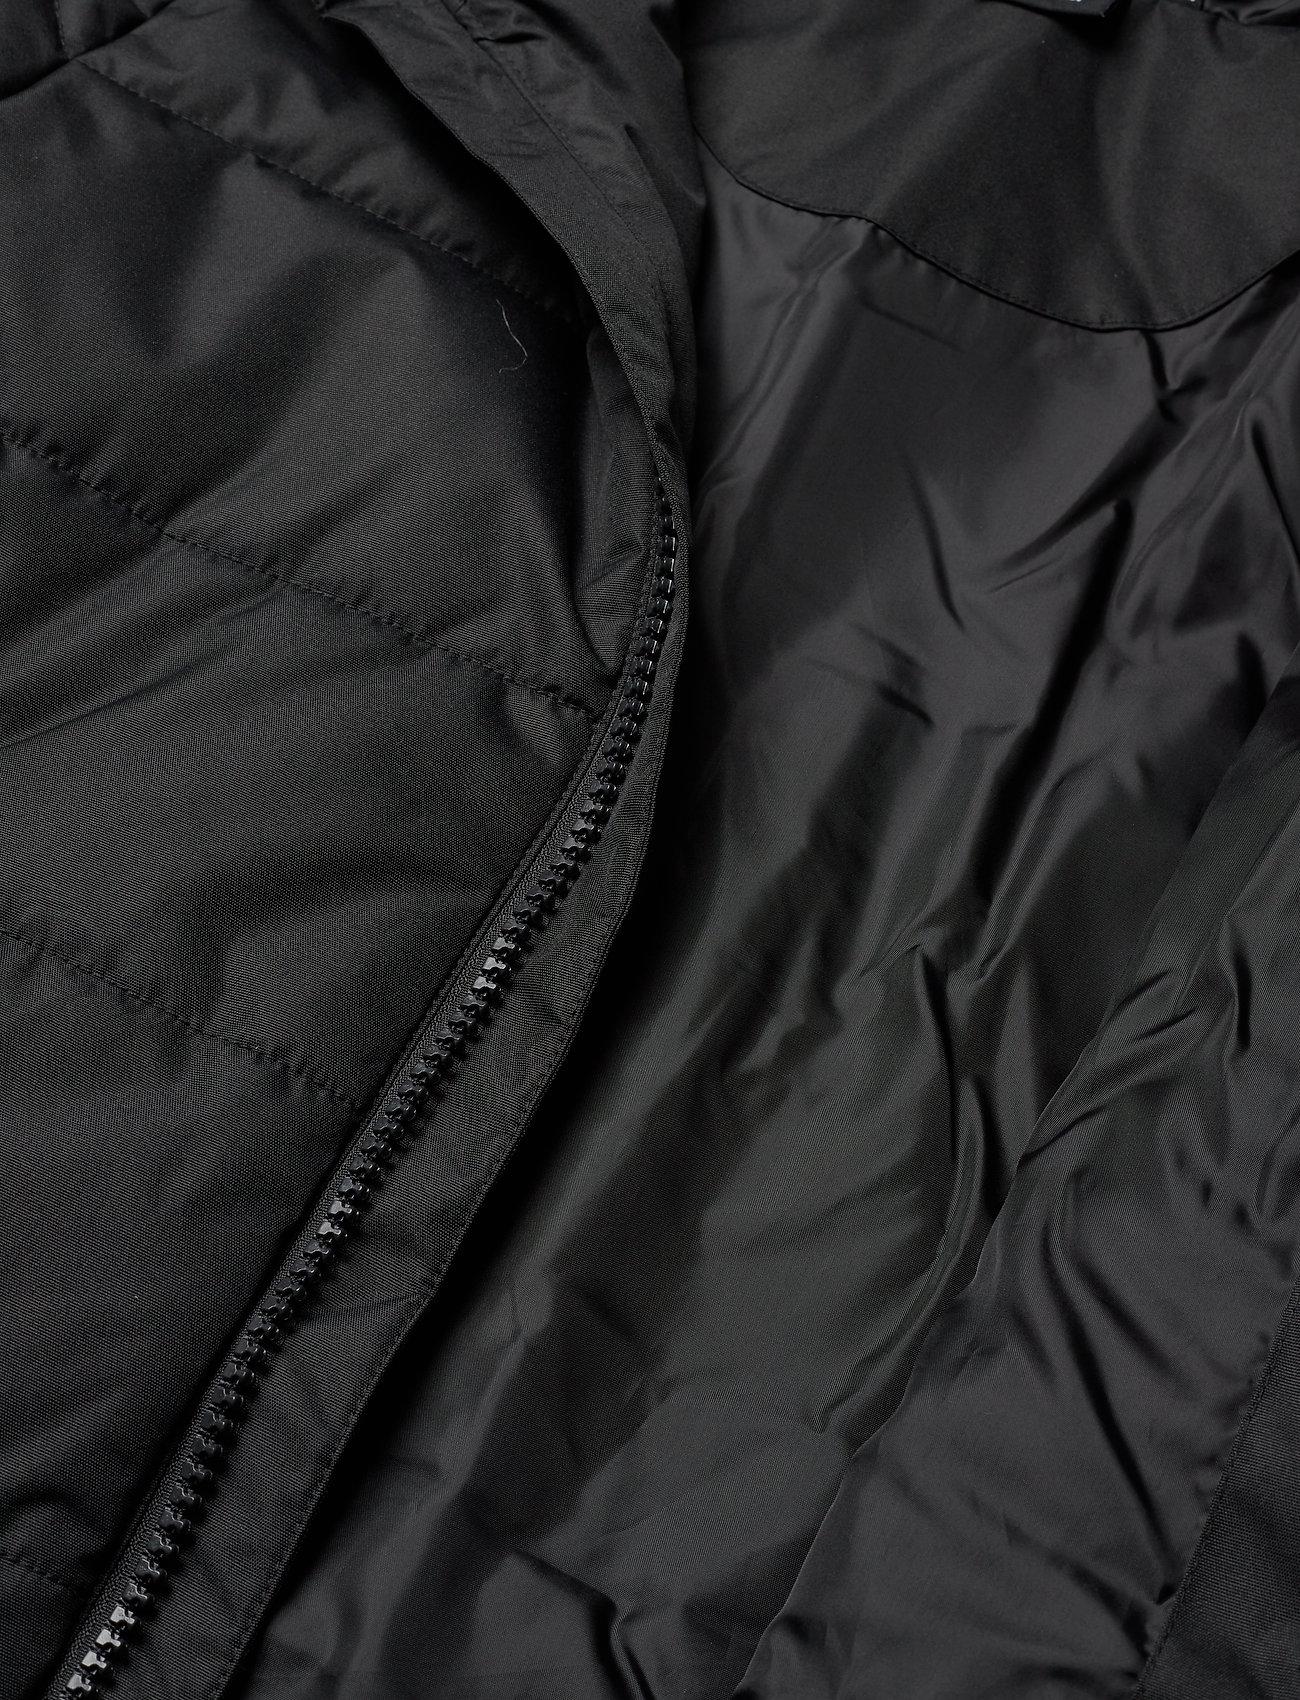 Hummel Hmlsilo Coat - Jackor Black